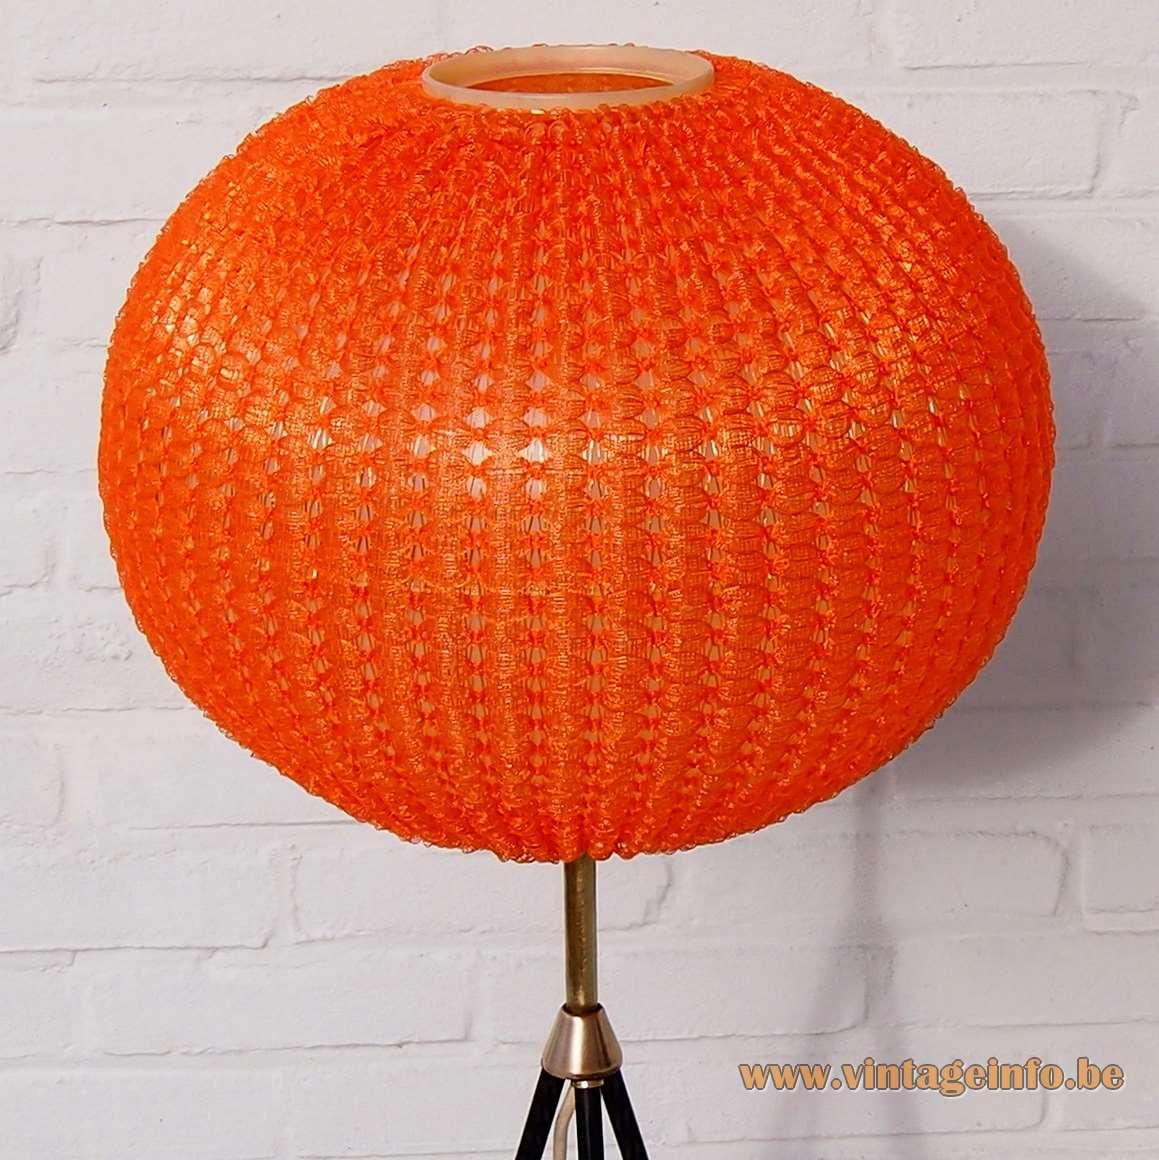 Aro Leuchte Tripod Globe Floor Lamp - Celluloid lampshade